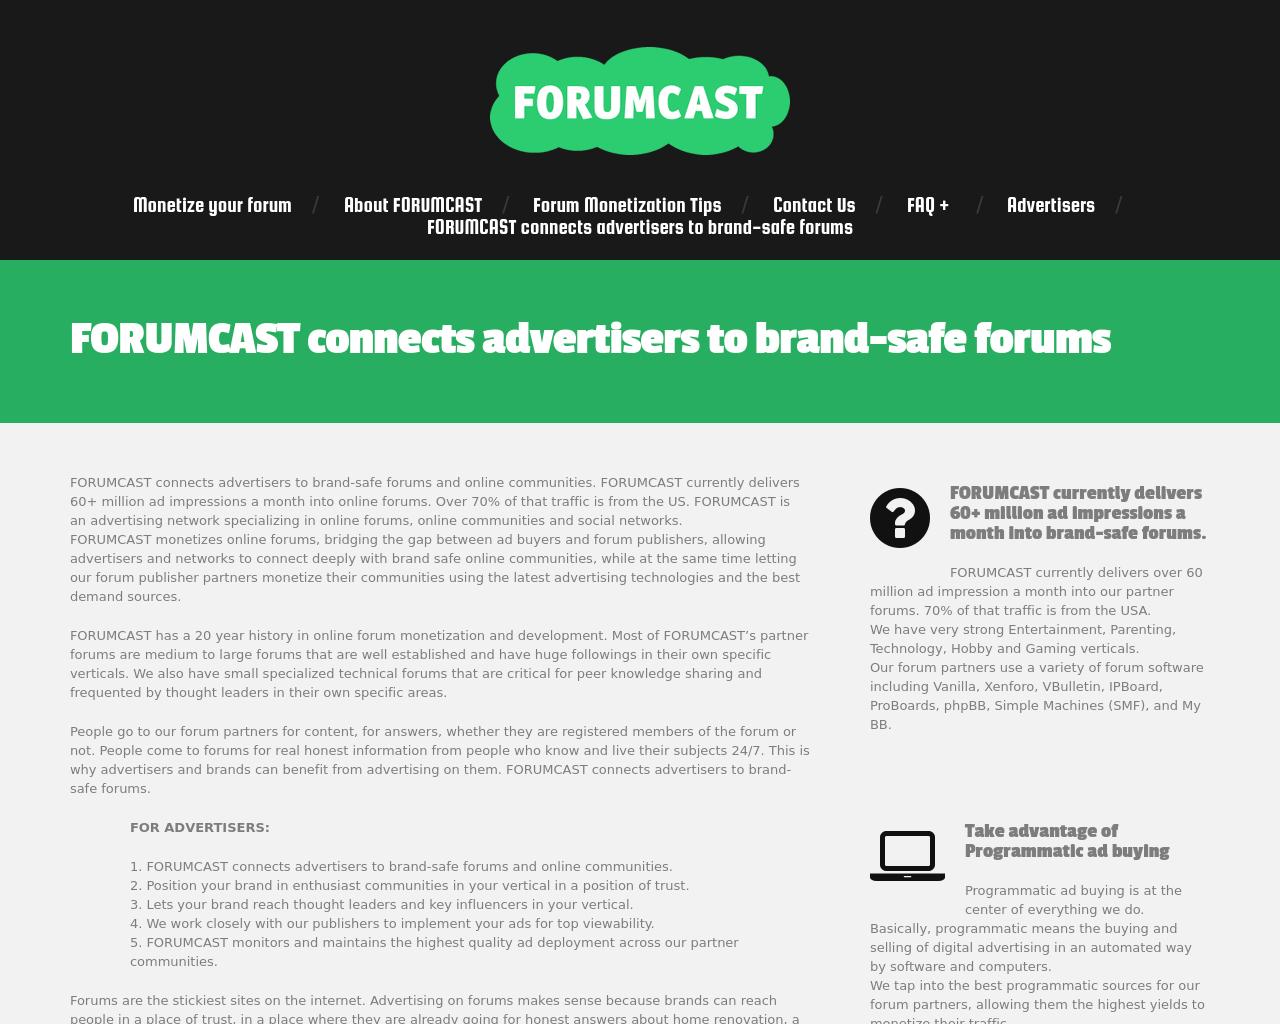 FORUMCAST-Advertising-Reviews-Pricing